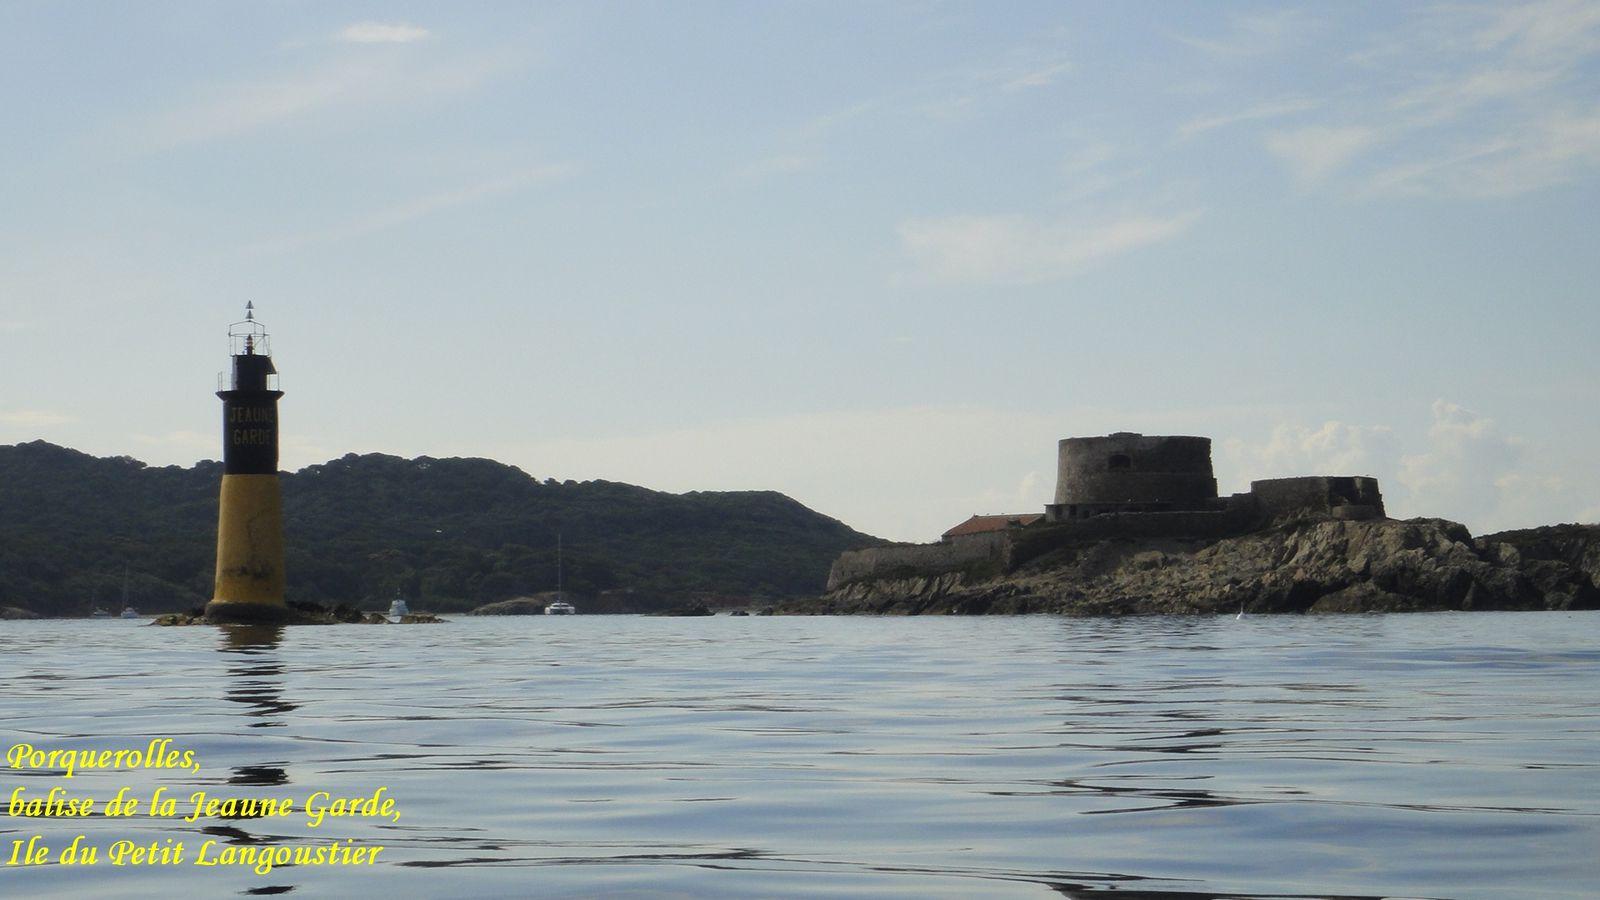 Rando kayak Giens - Porquerolles - Port Cros - Embiez  -  Juin 2011